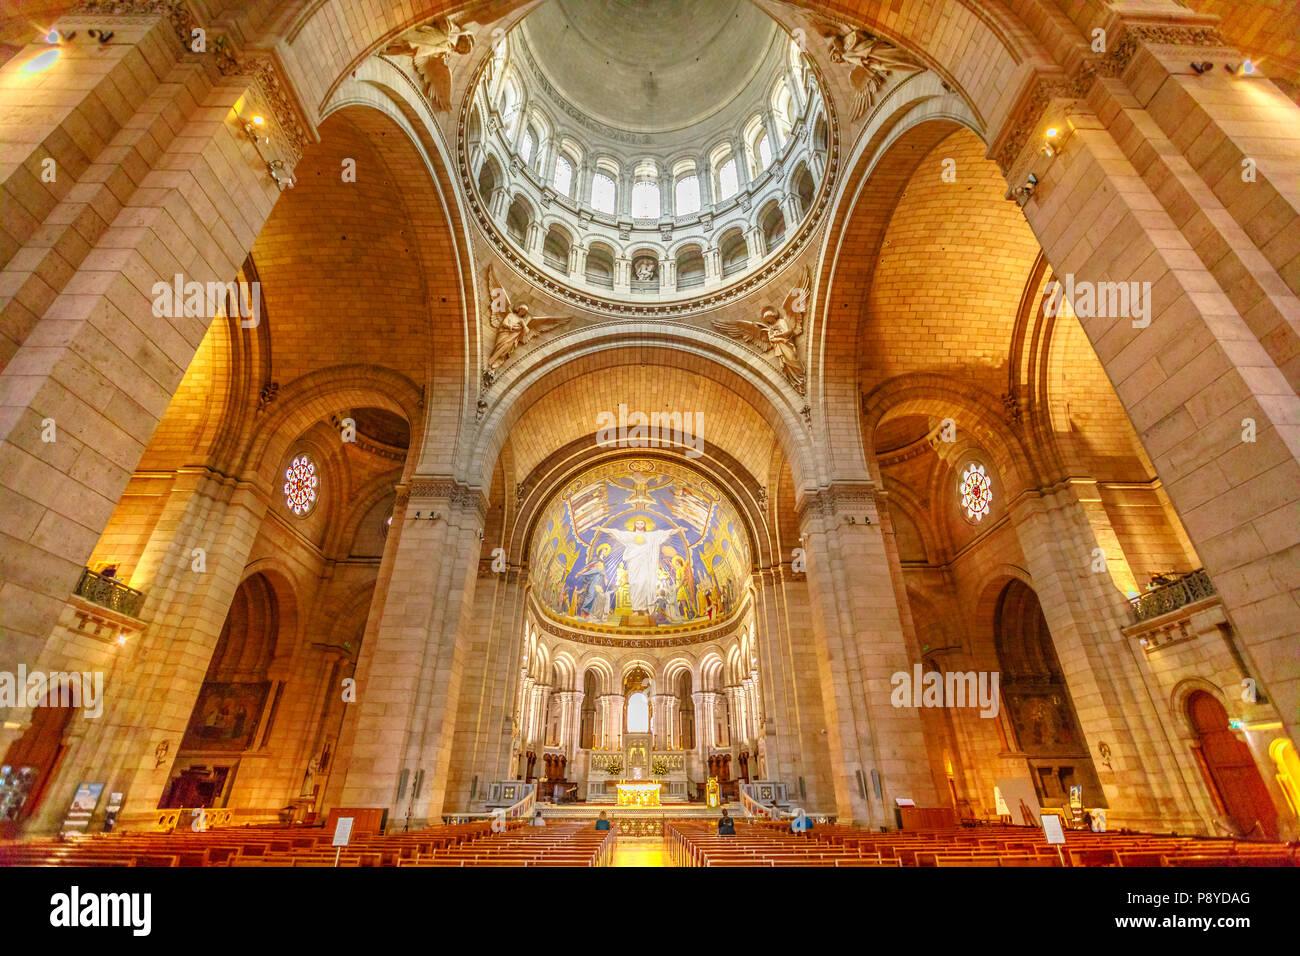 Paris France July 3 2017 Central Nave Colonnade Of Sacre